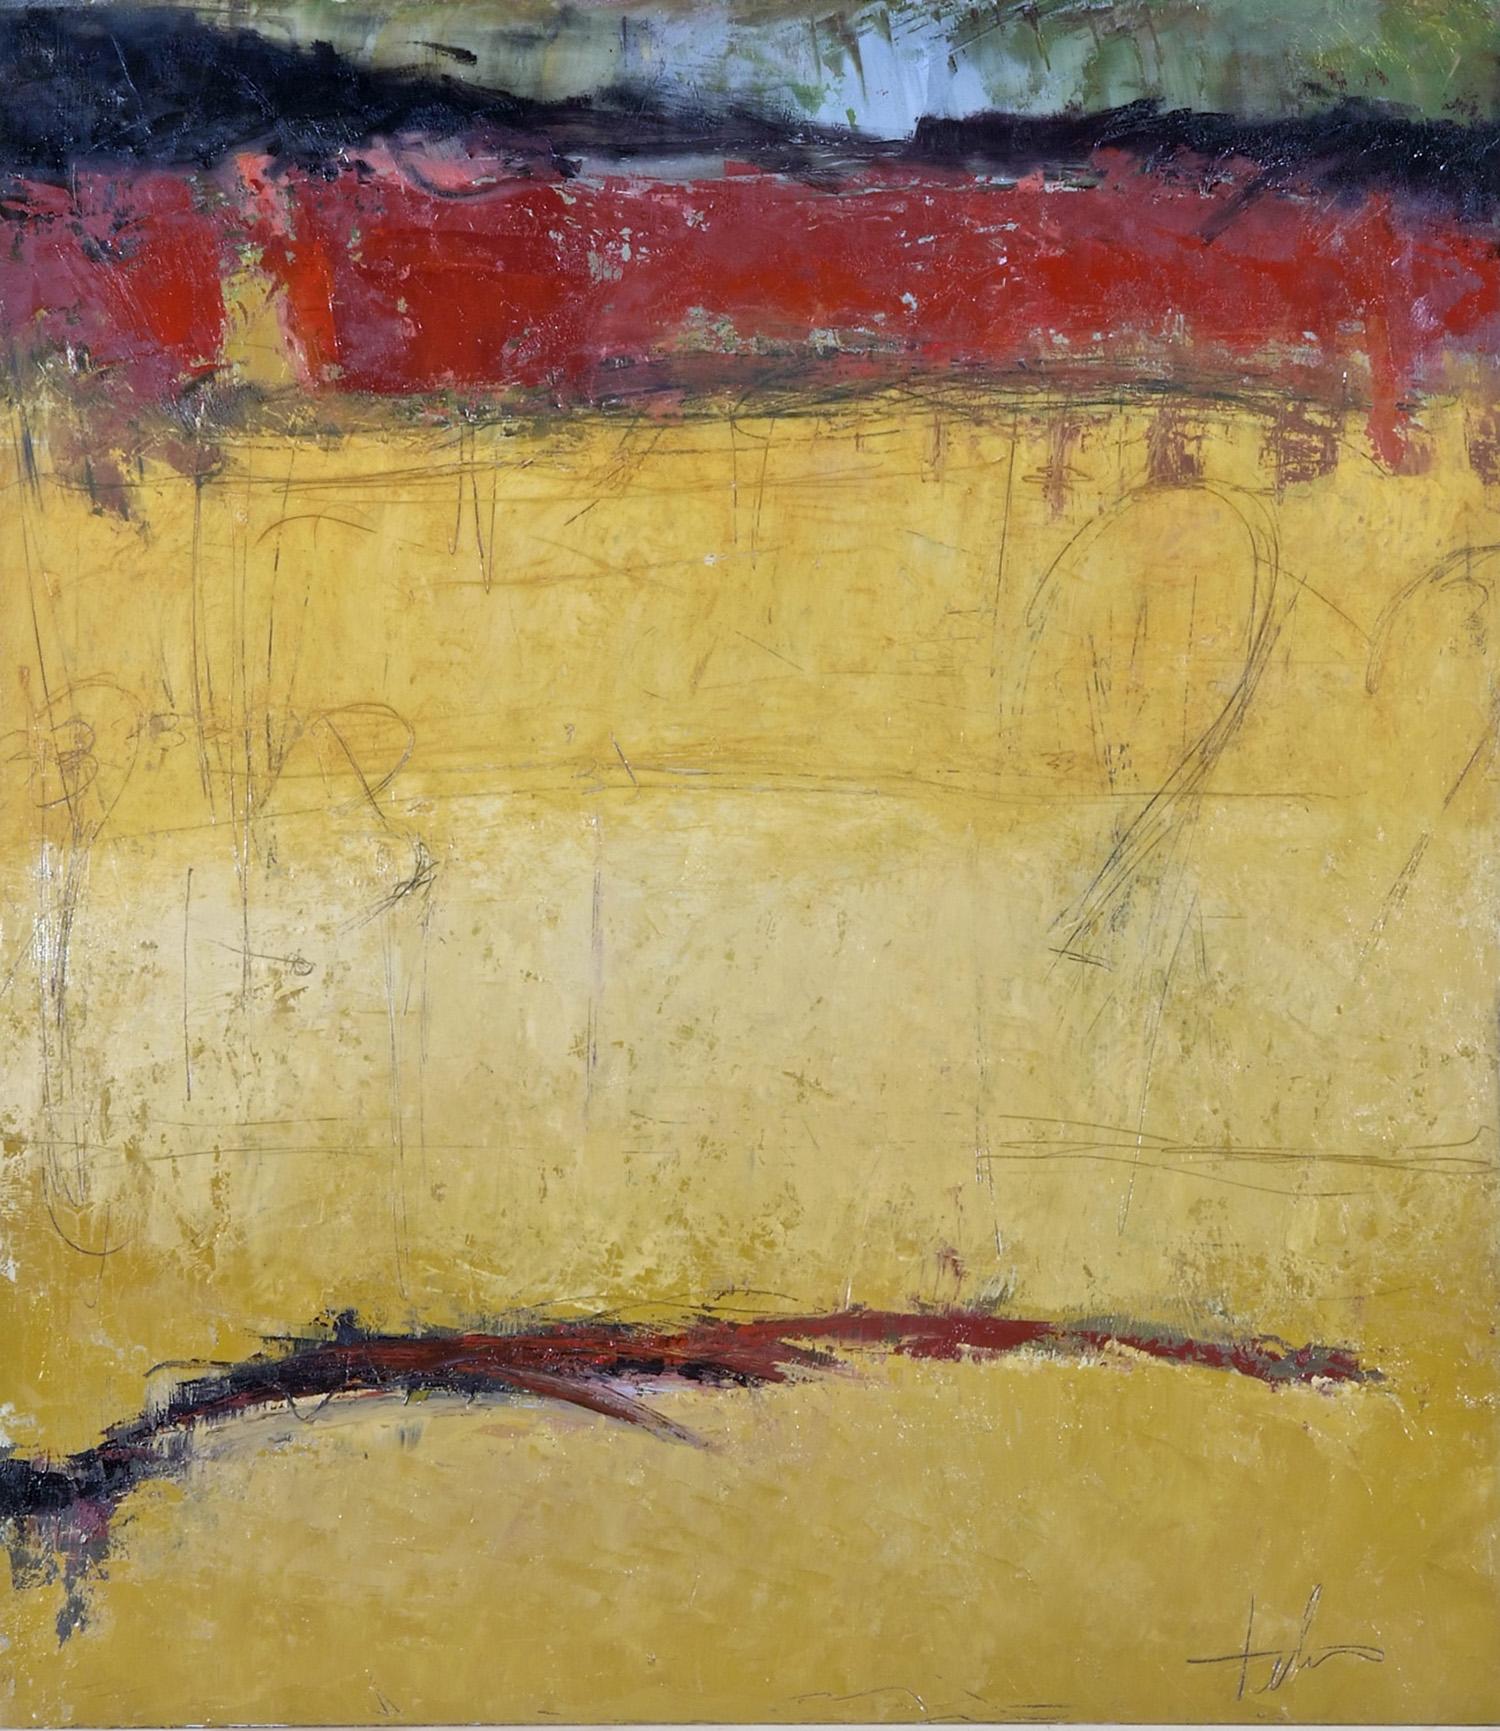 "Indian Heat • Oil on canvas • 42 x 34"""